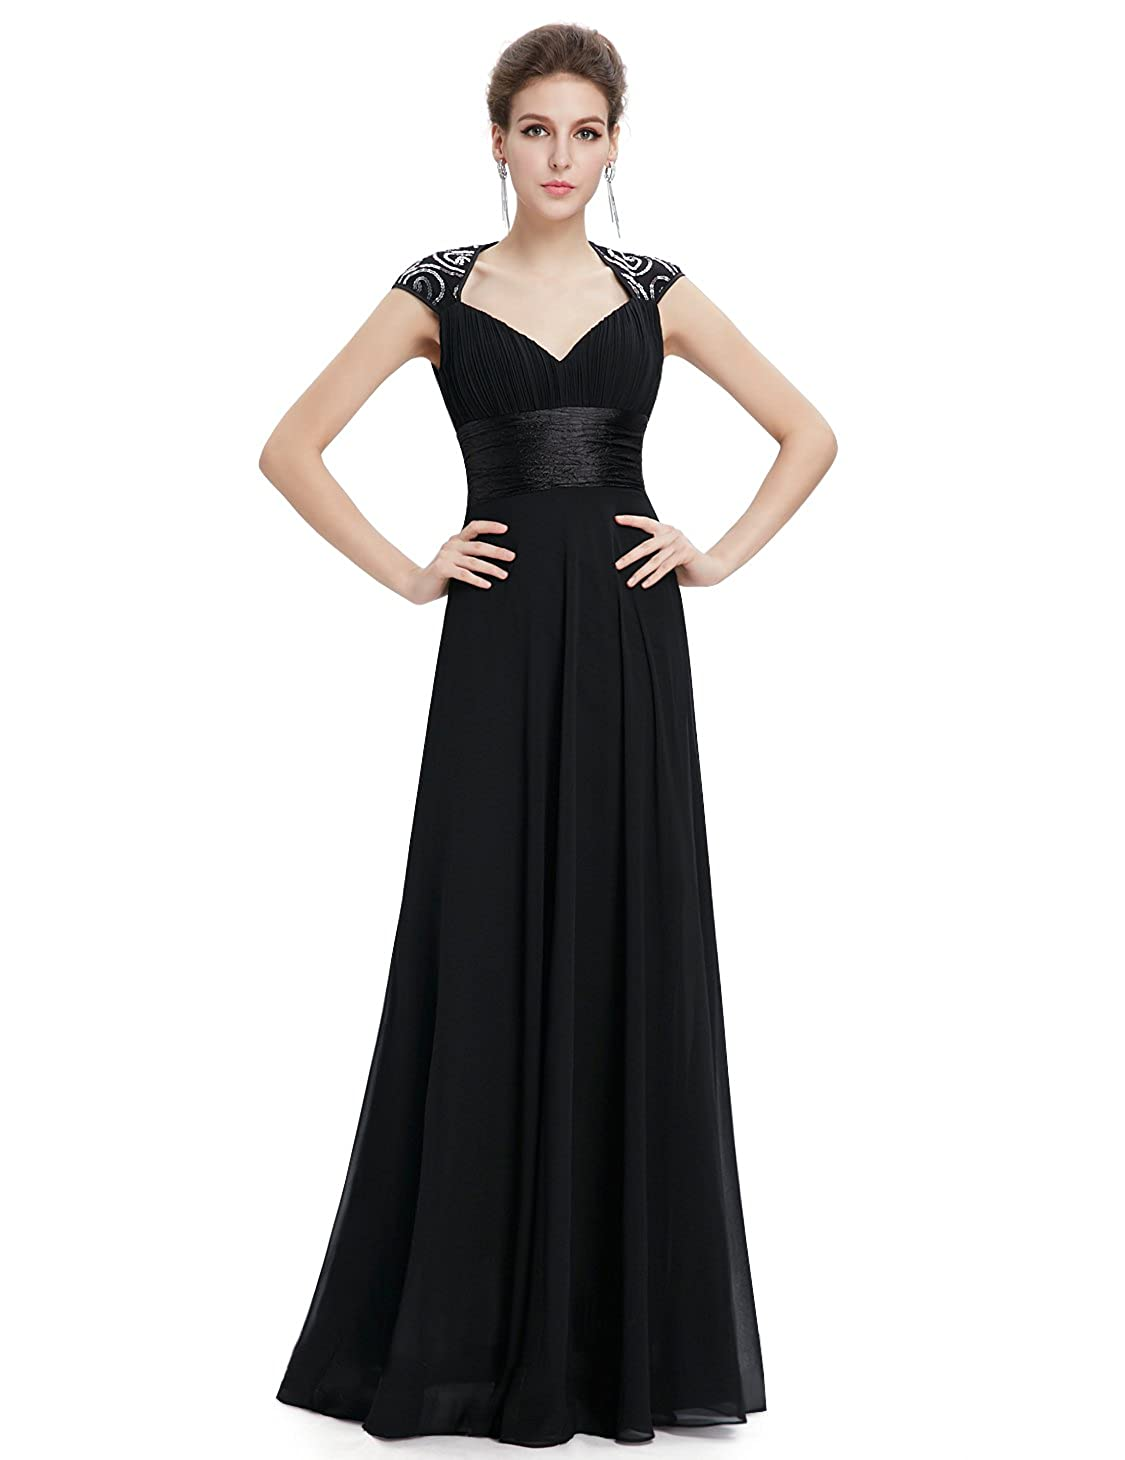 475545d8b1 Ever-Pretty Chiffon Sexy V-Neck Ruched Empire Line Evening Dress 09672